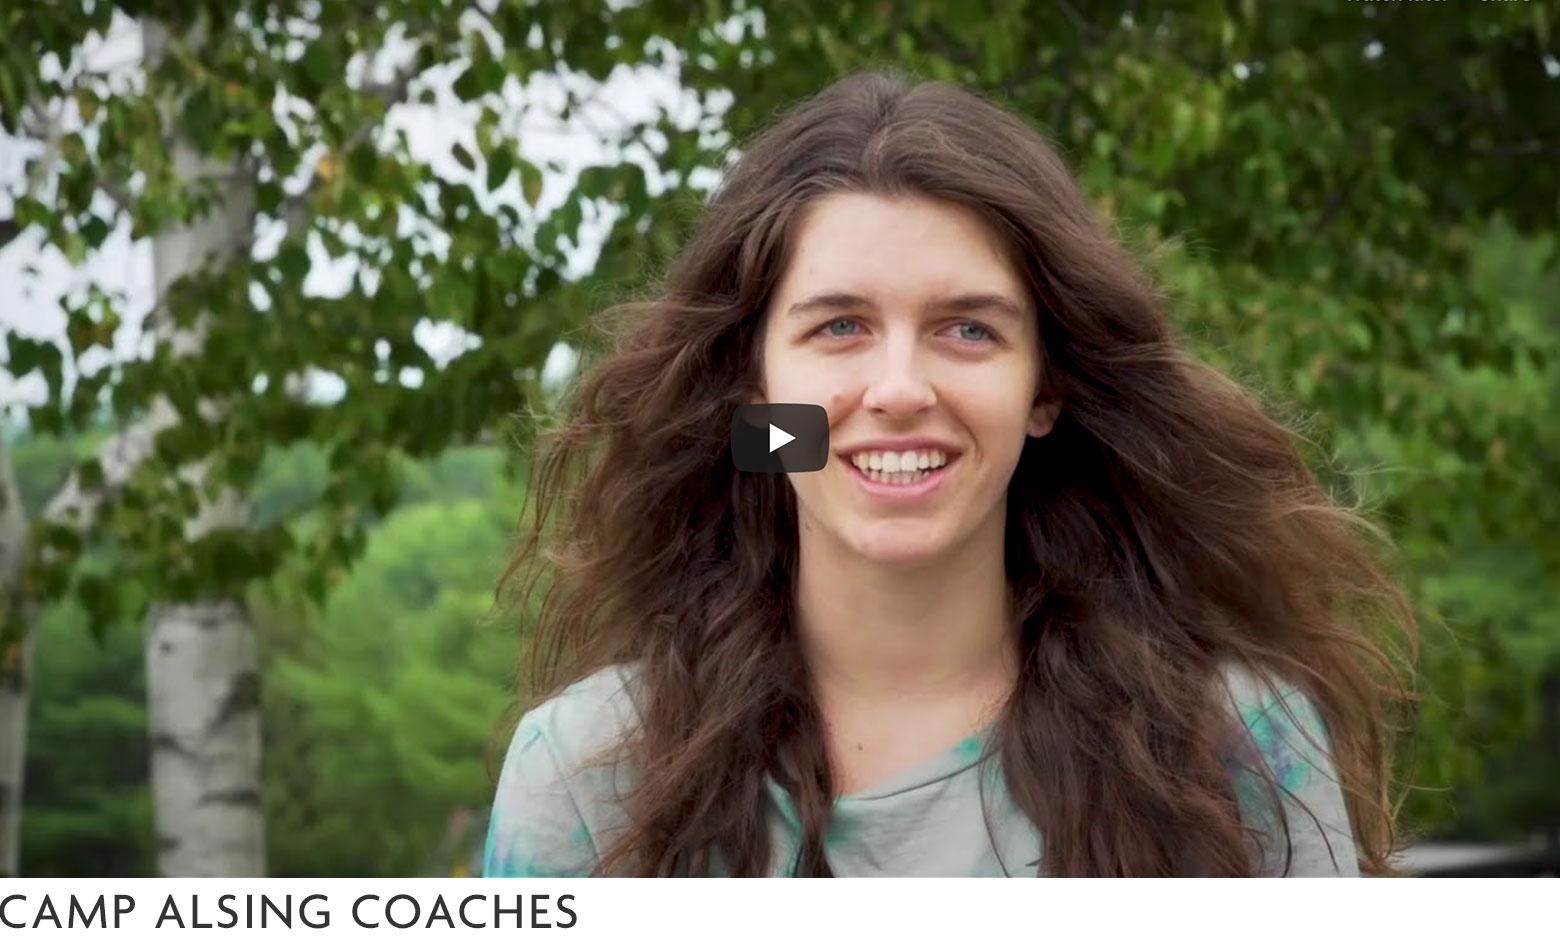 Camp Alsing Coaches